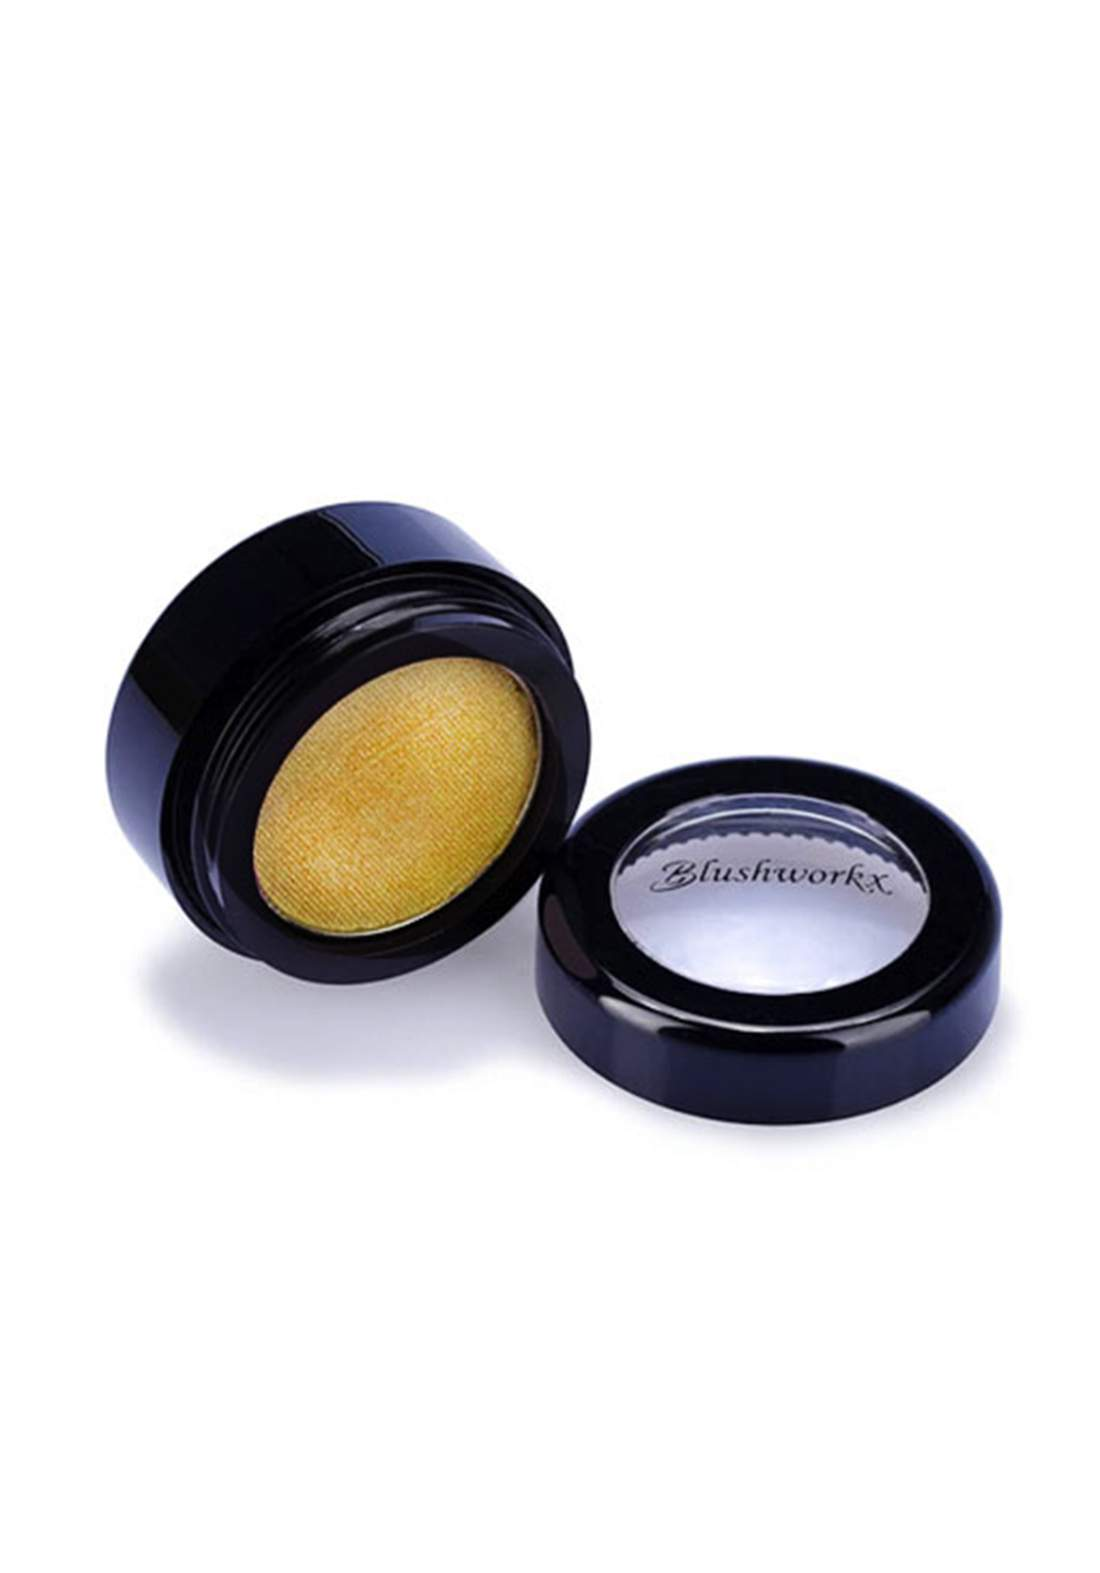 Blushworkx Hollywood Mineral Eye Color No.B14 Sun Gold 1.8g ظلال للعيون